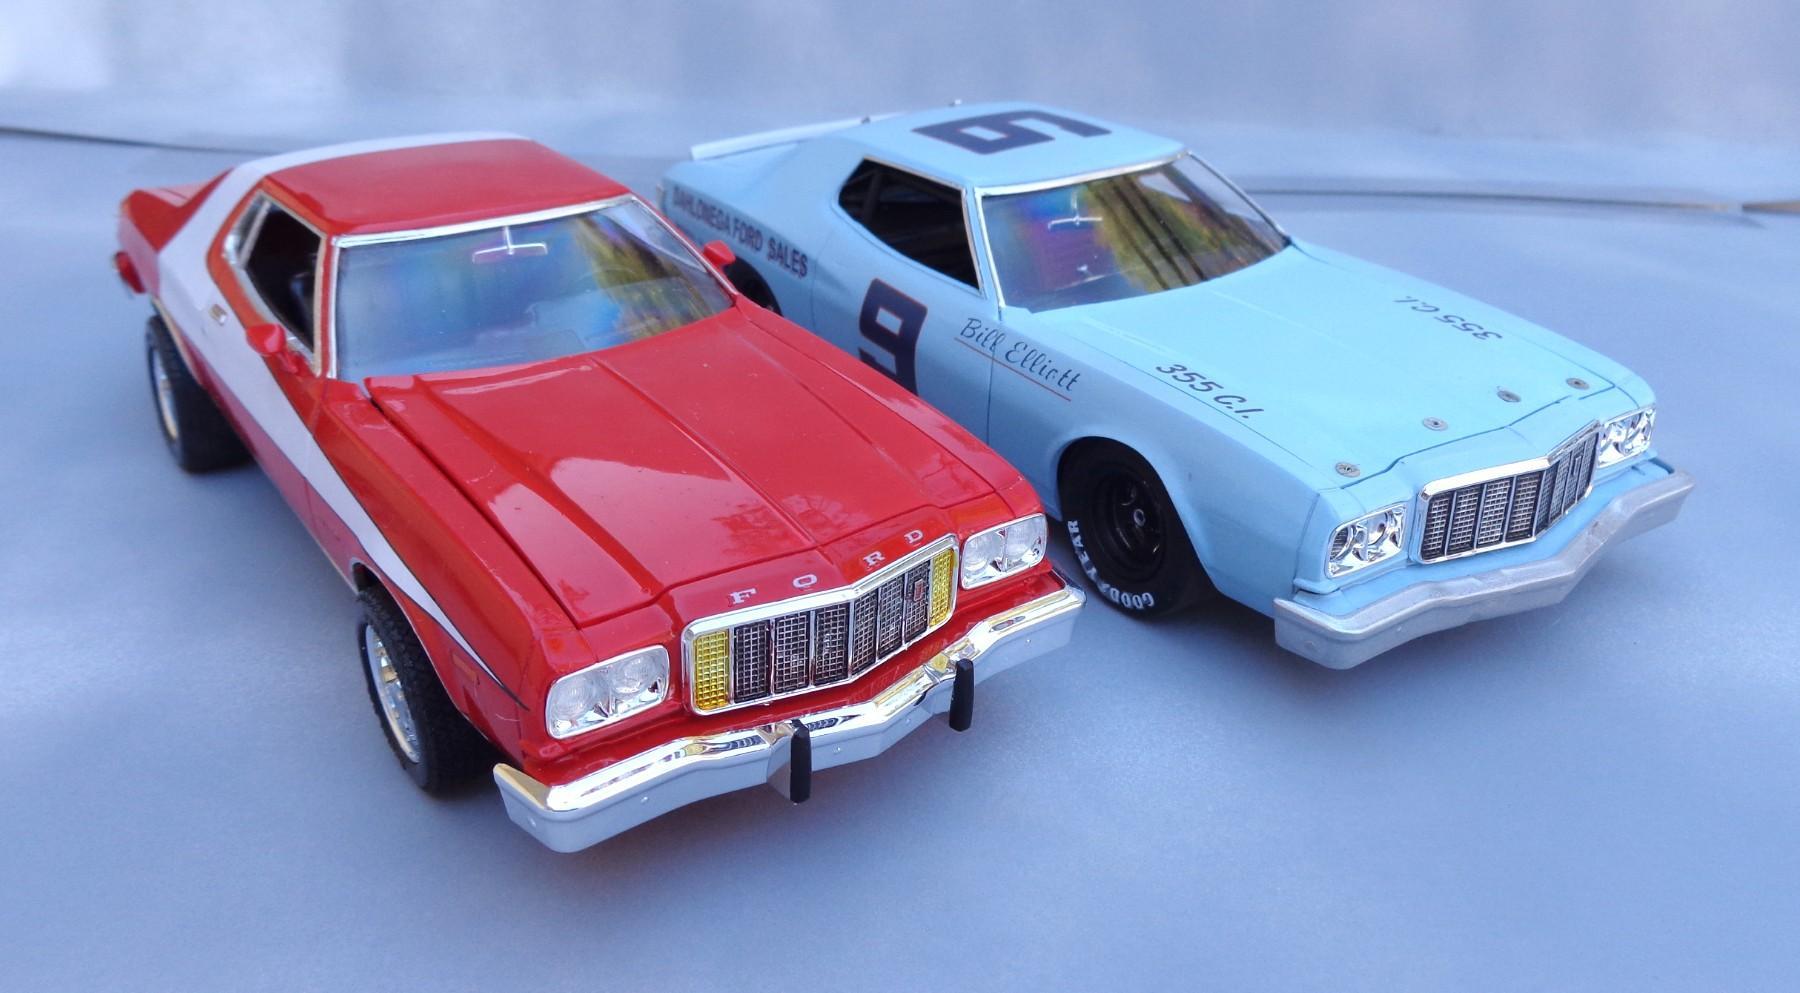 Starsky hutch slot car